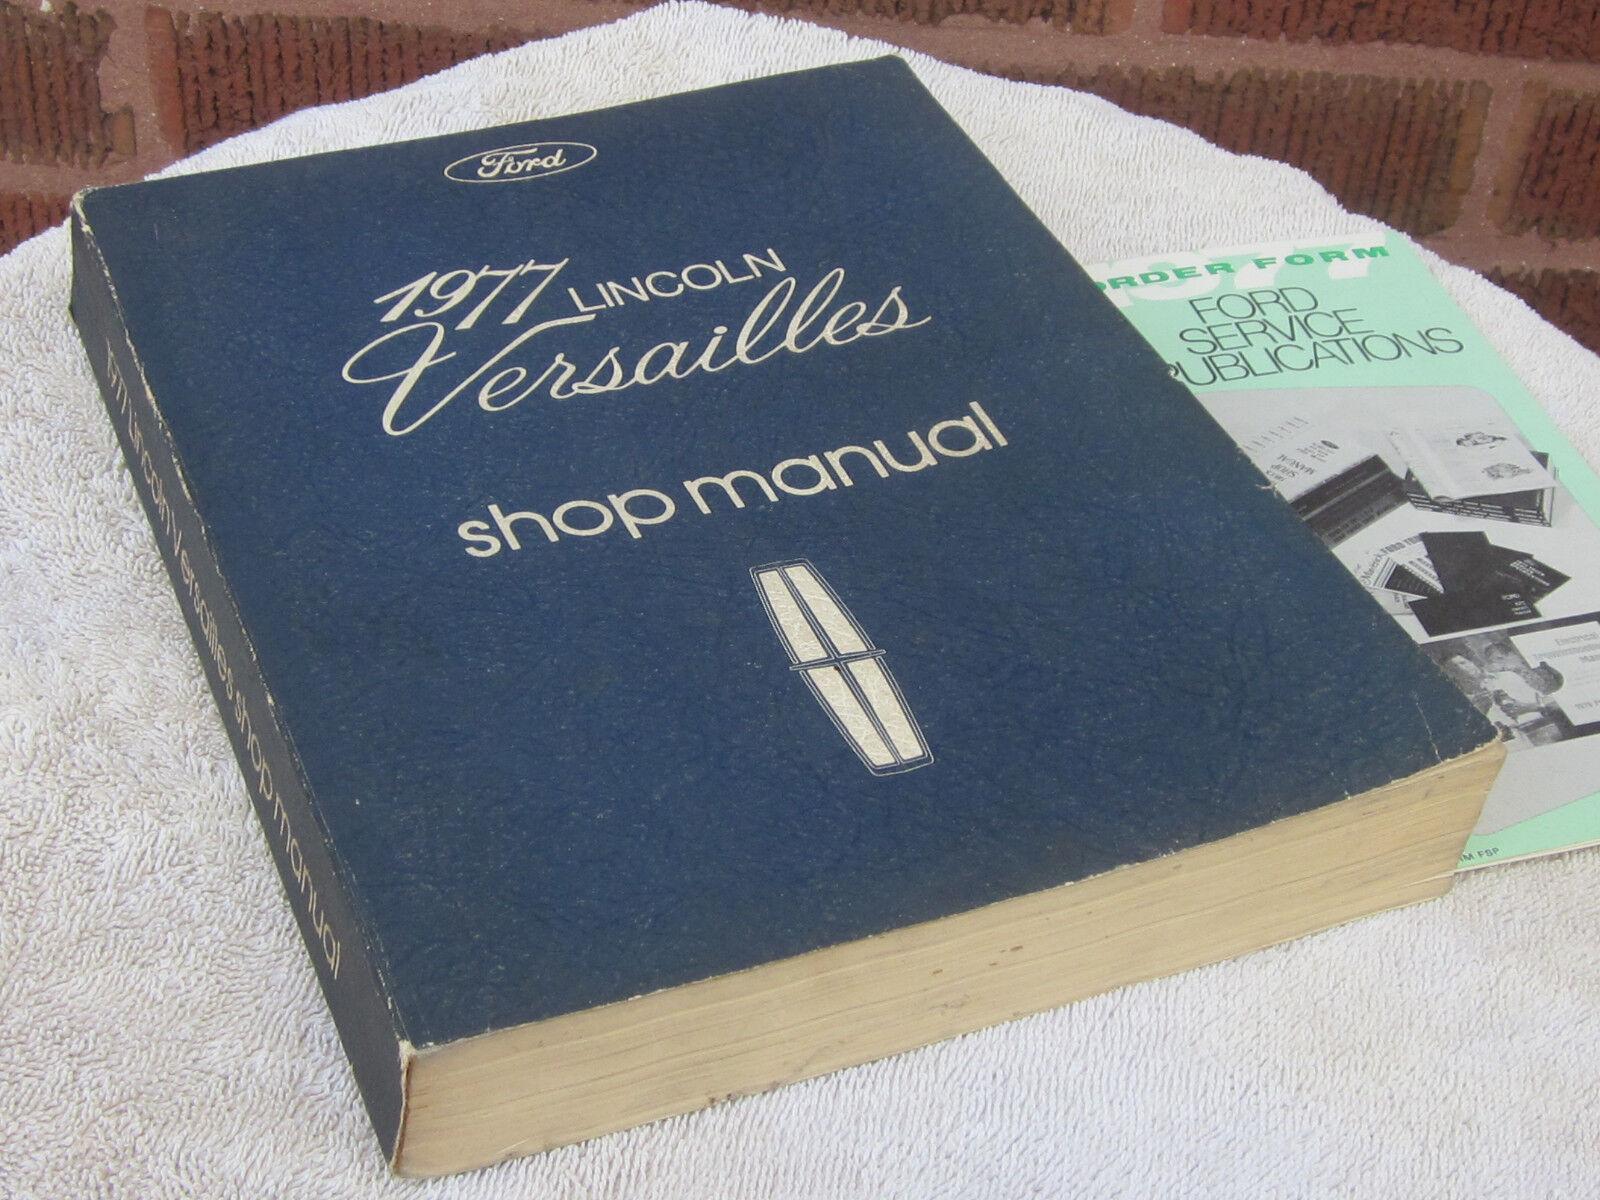 1977 Lincoln Versailles Shop Manual Original Service Book complete & intact